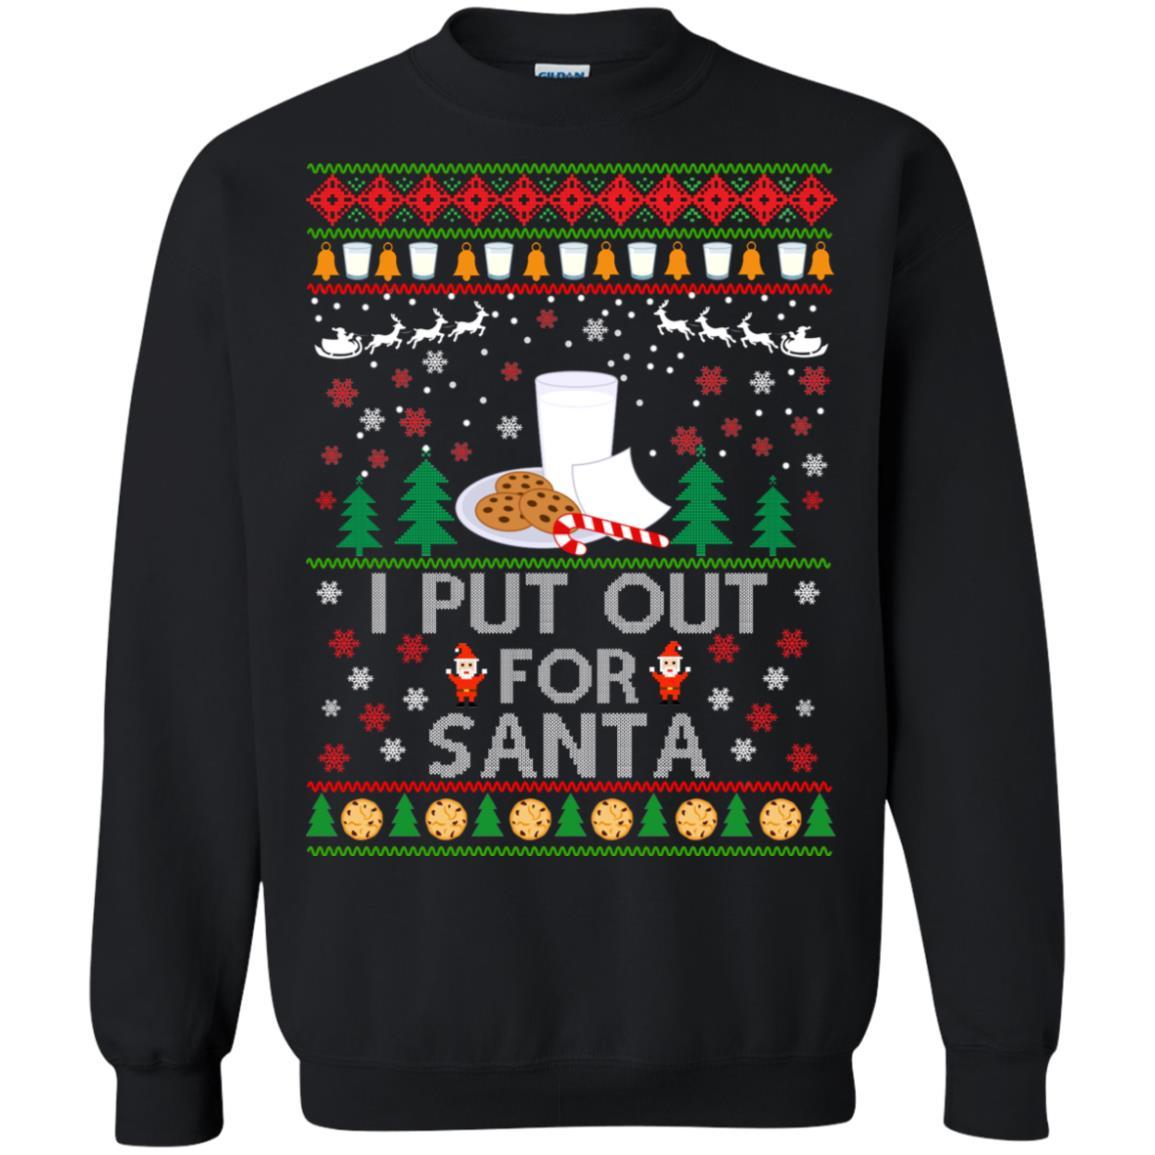 I Put Out For Santa Christmas Sweatshirt Hoodie Long Sleeve